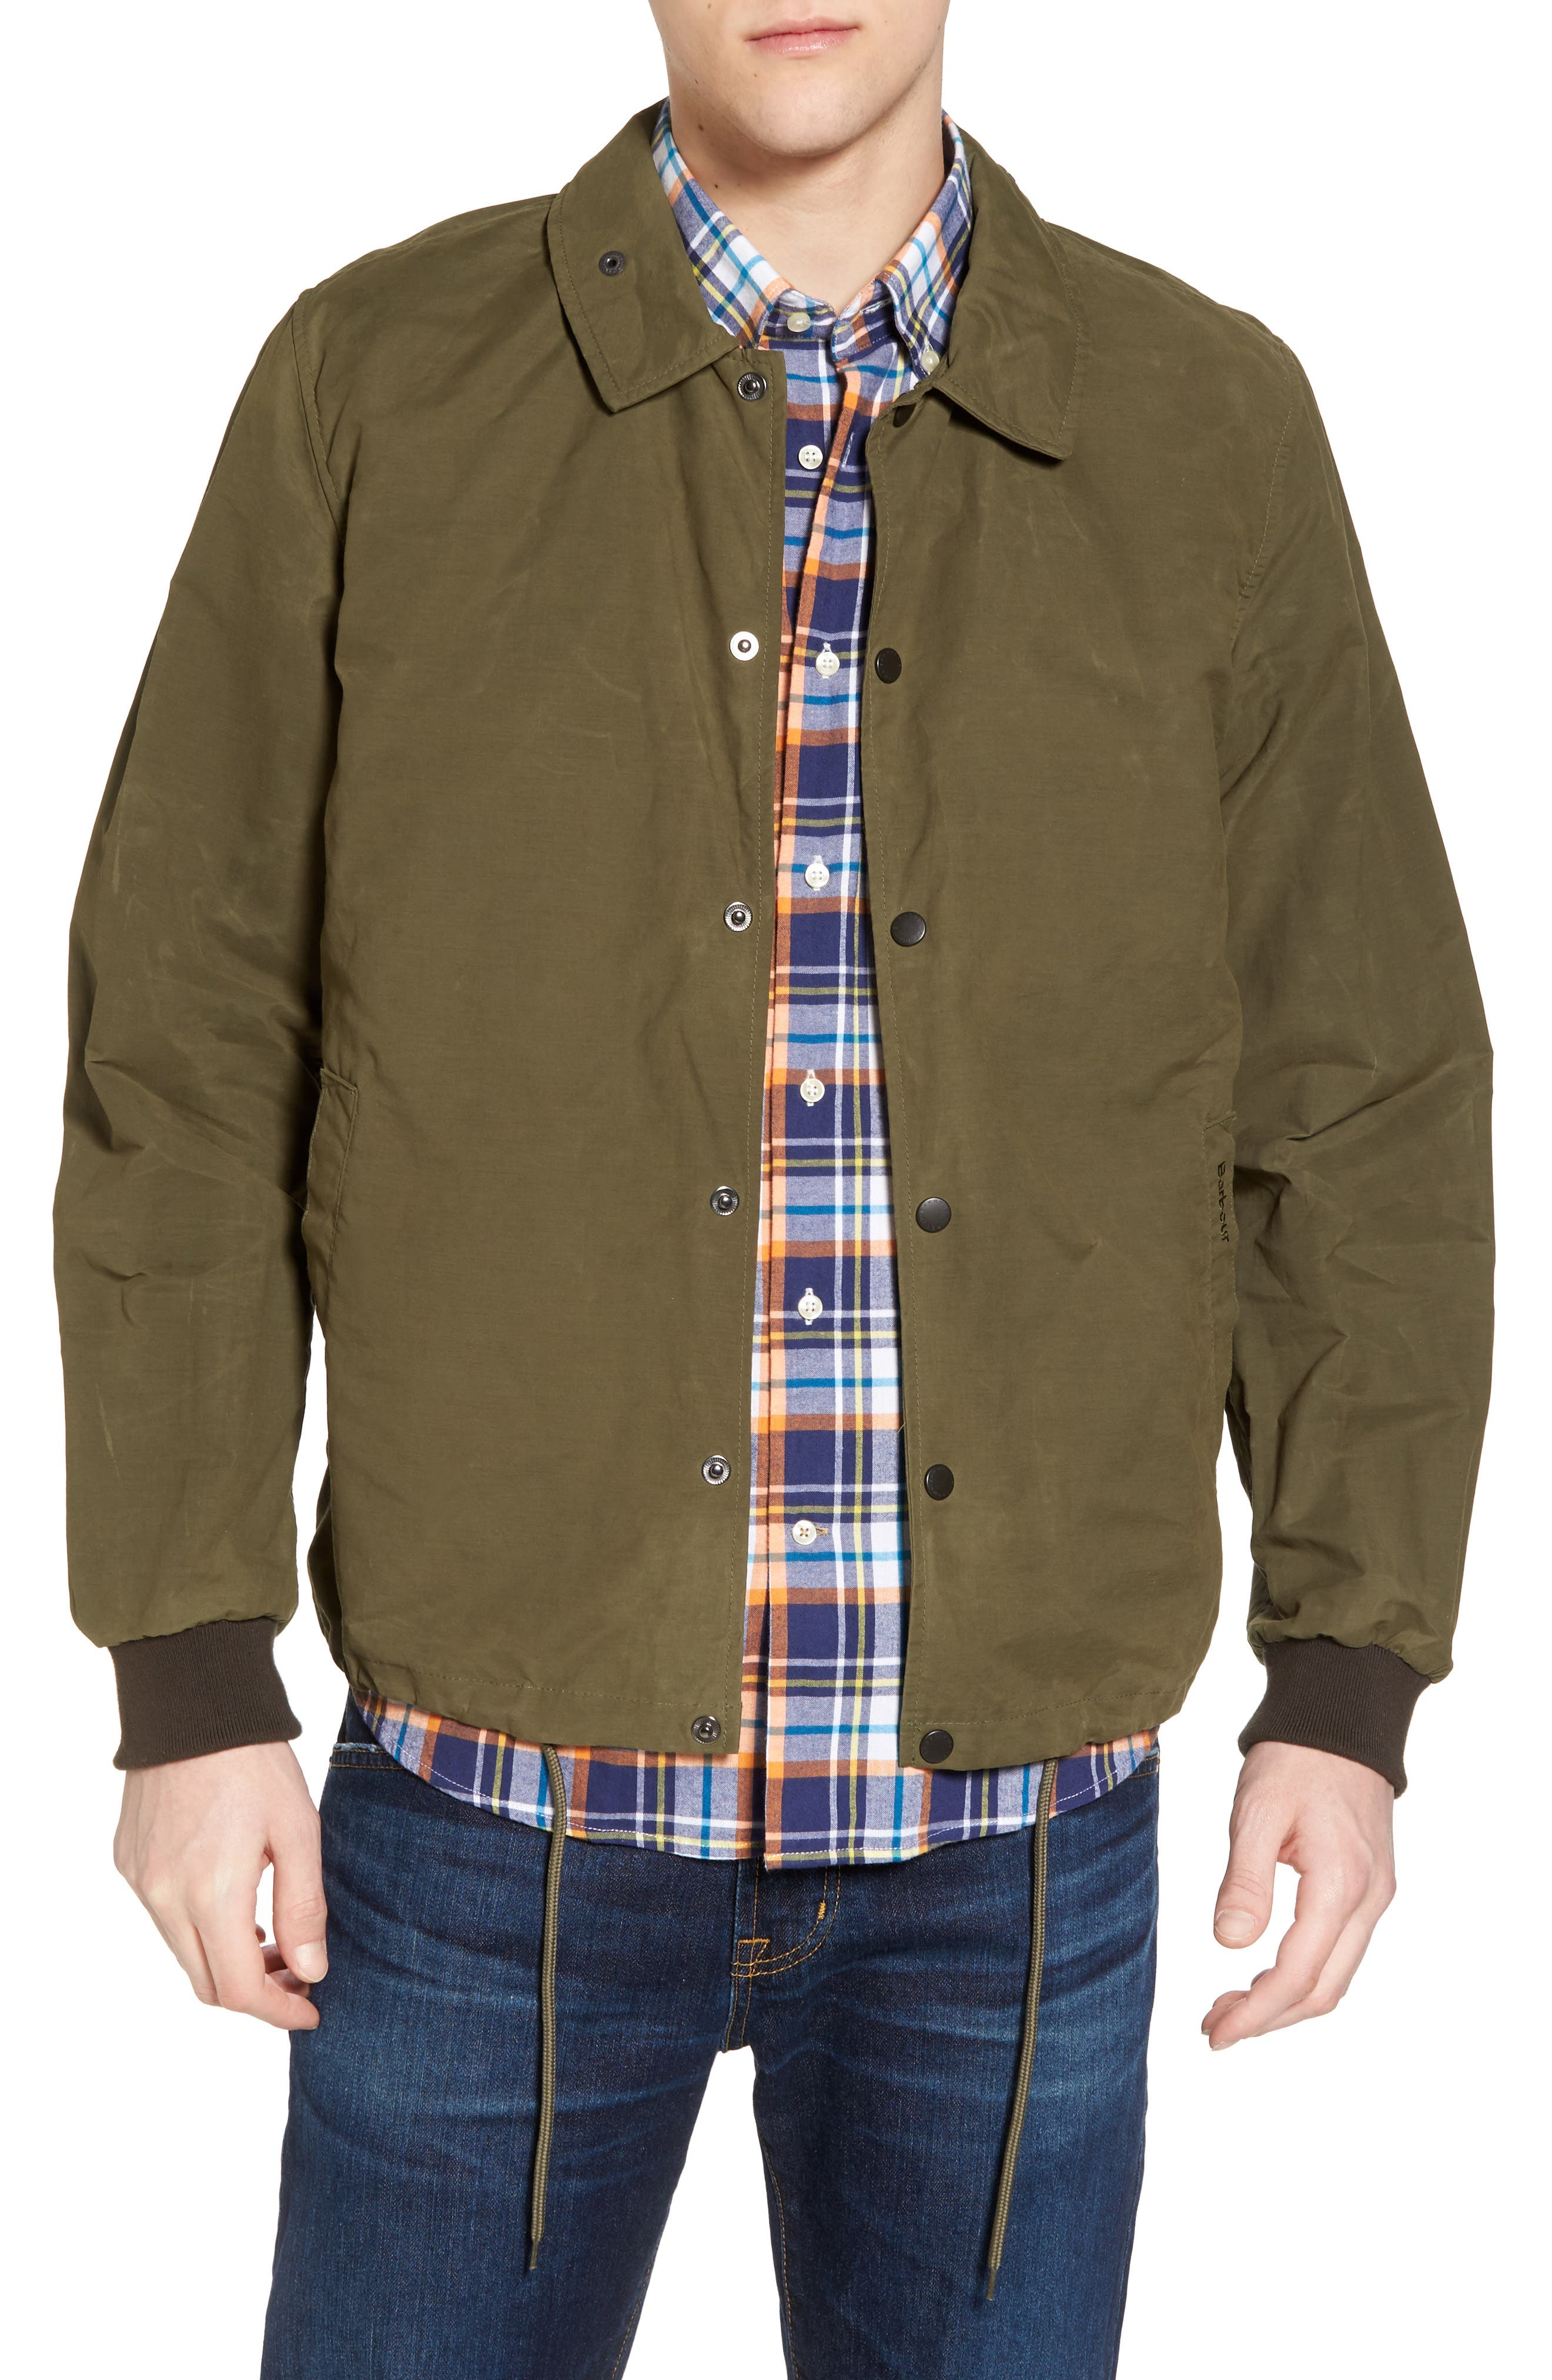 Barbour Reel Jacket